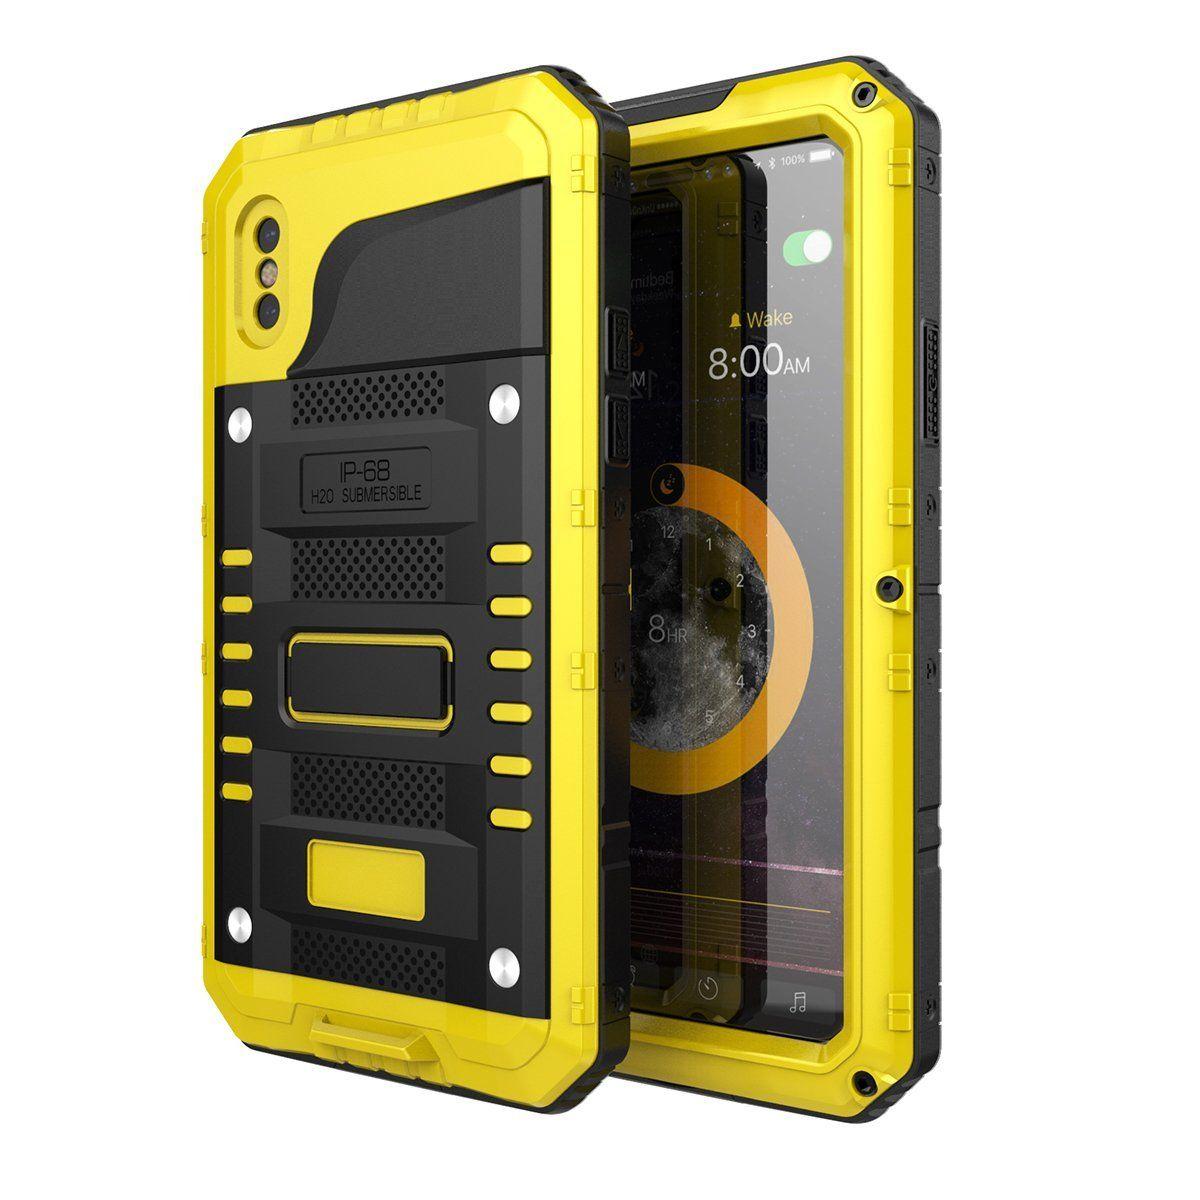 Aluminum alloy phone case fall resistant waterproof